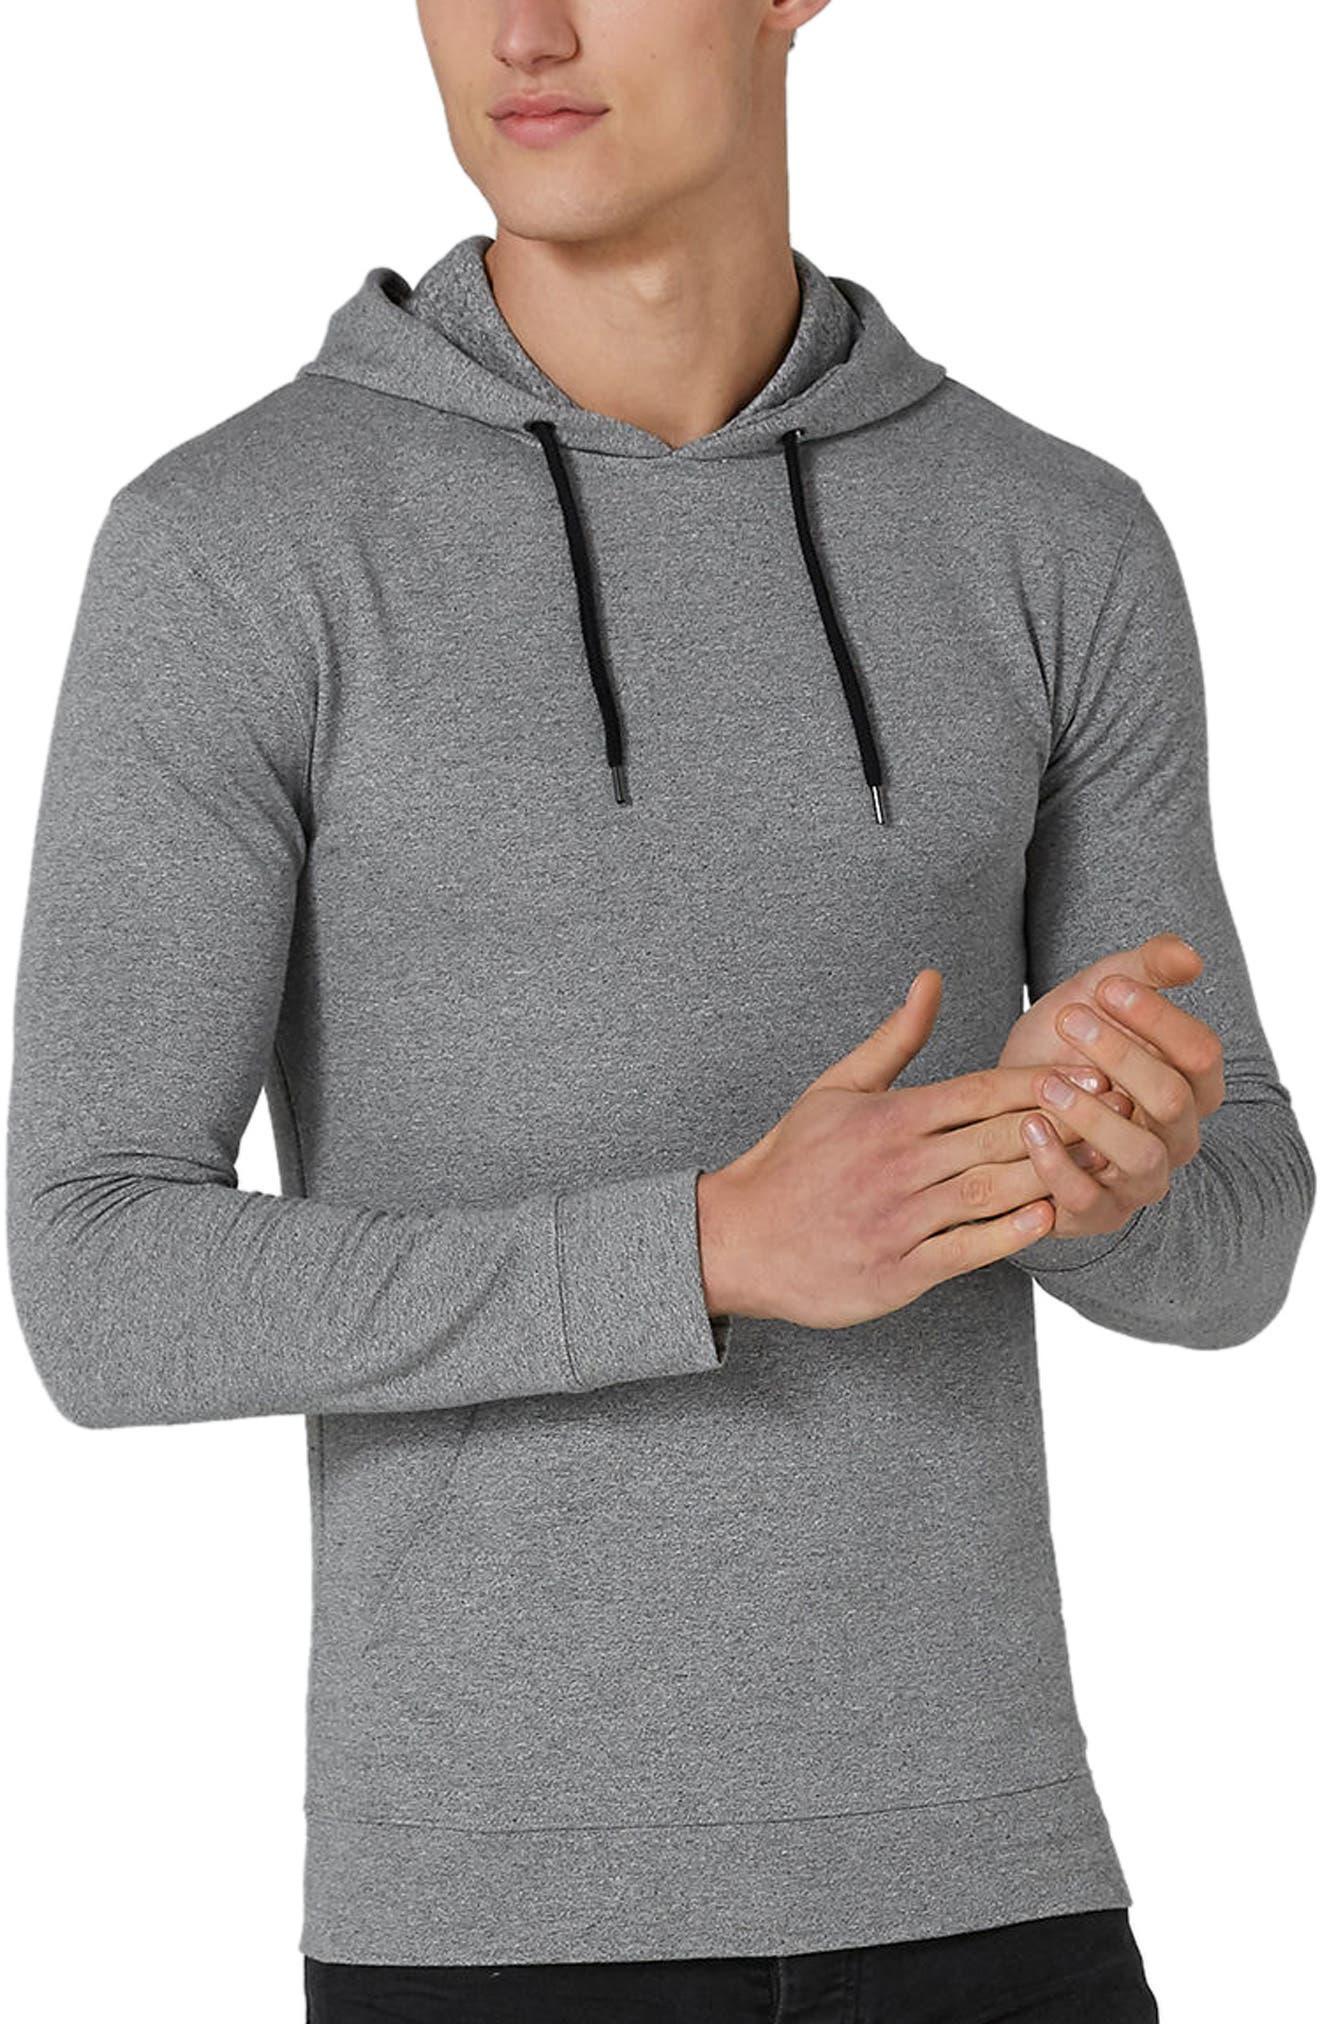 Muscle Fit Hoodie,                         Main,                         color, 020